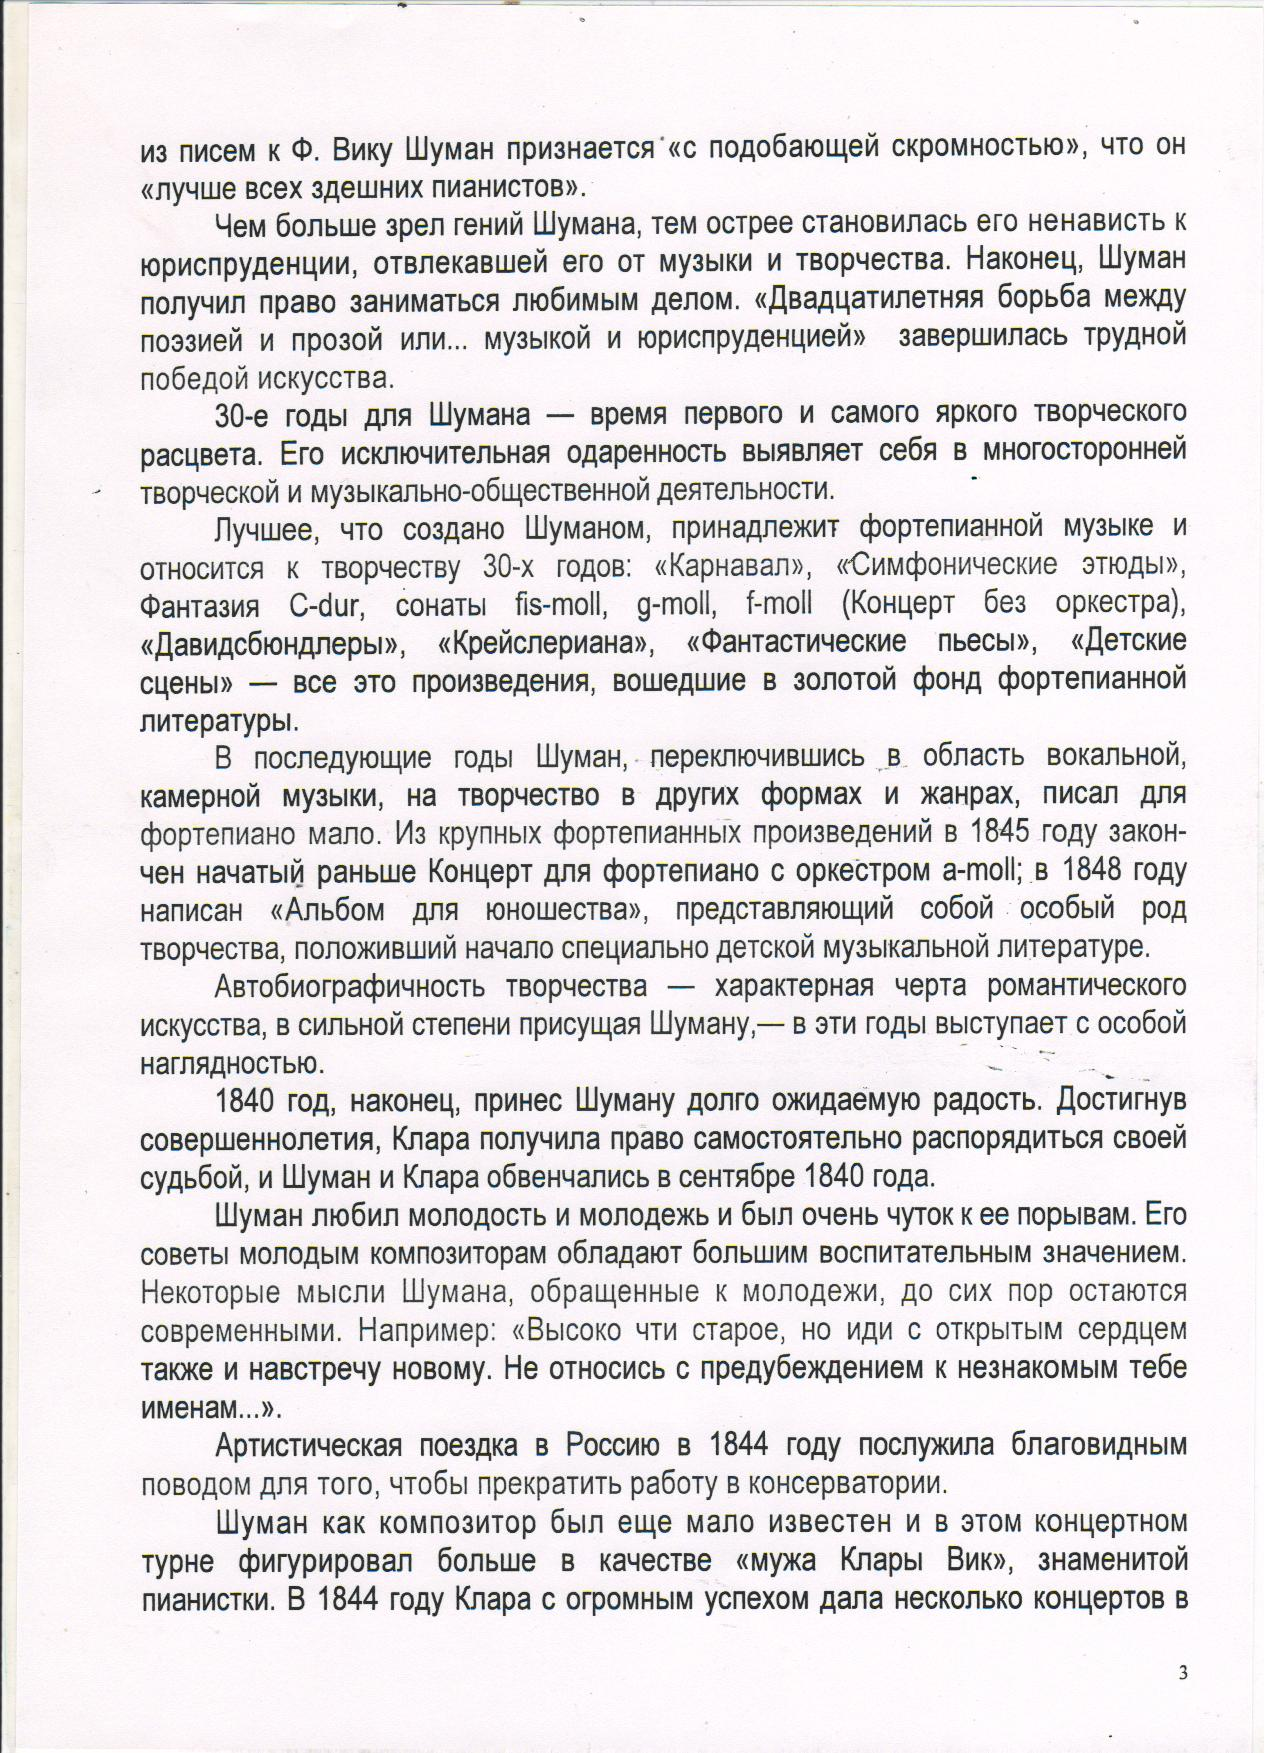 C:\Documents and Settings\Учитель\Рабочий стол\Шуман 3.jpg